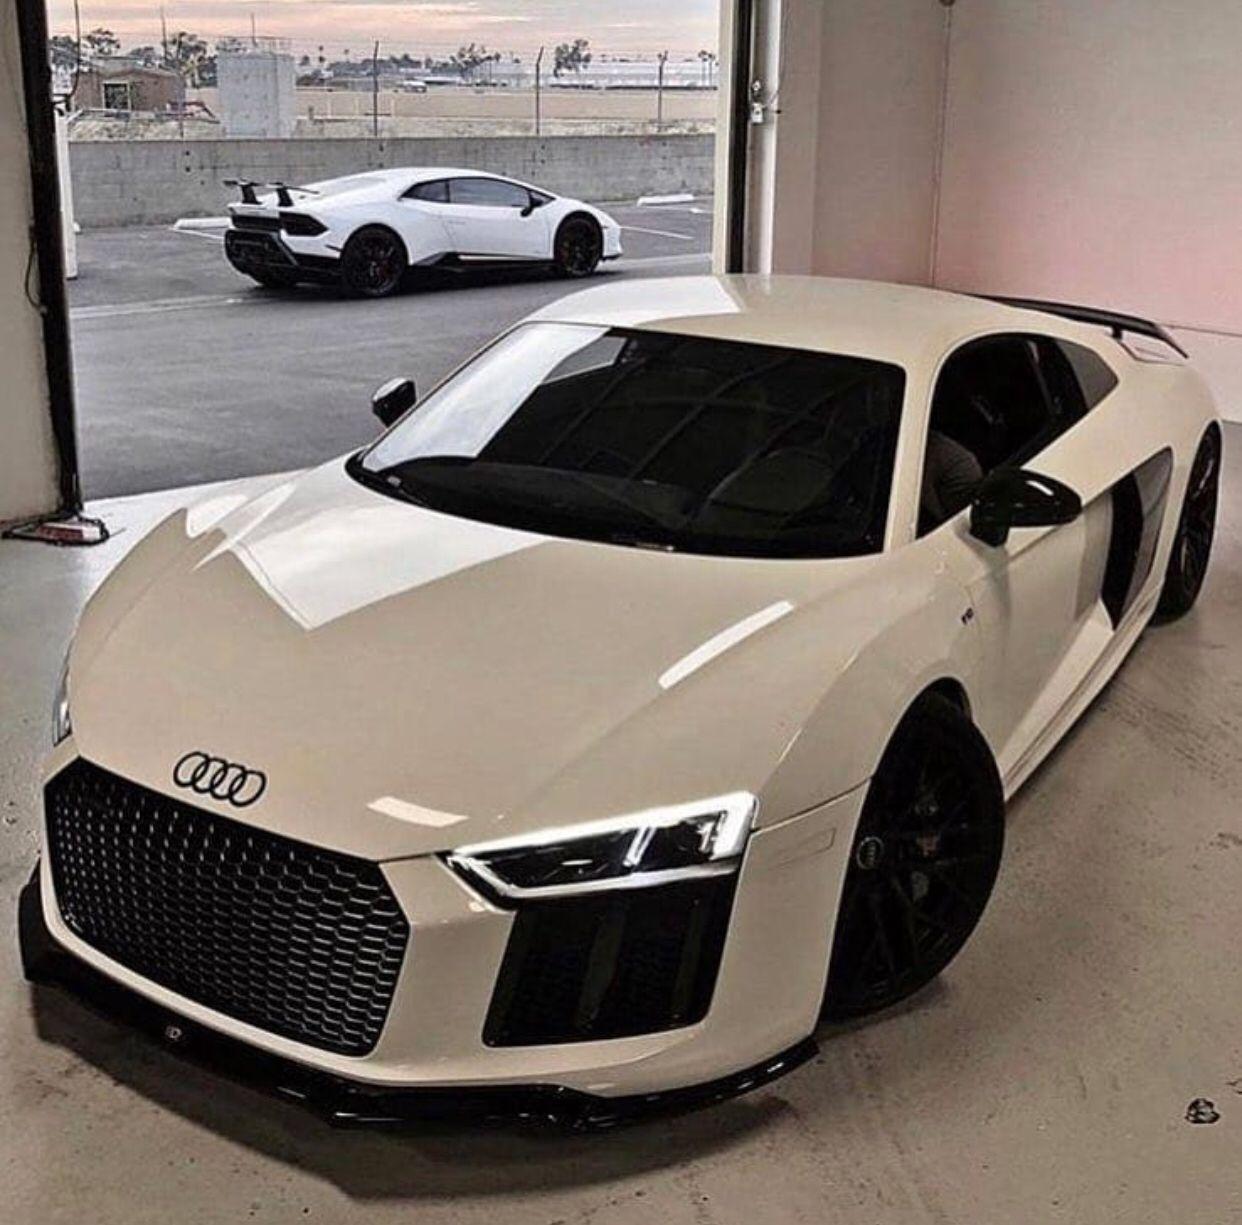 Audi r8 #luxurycars